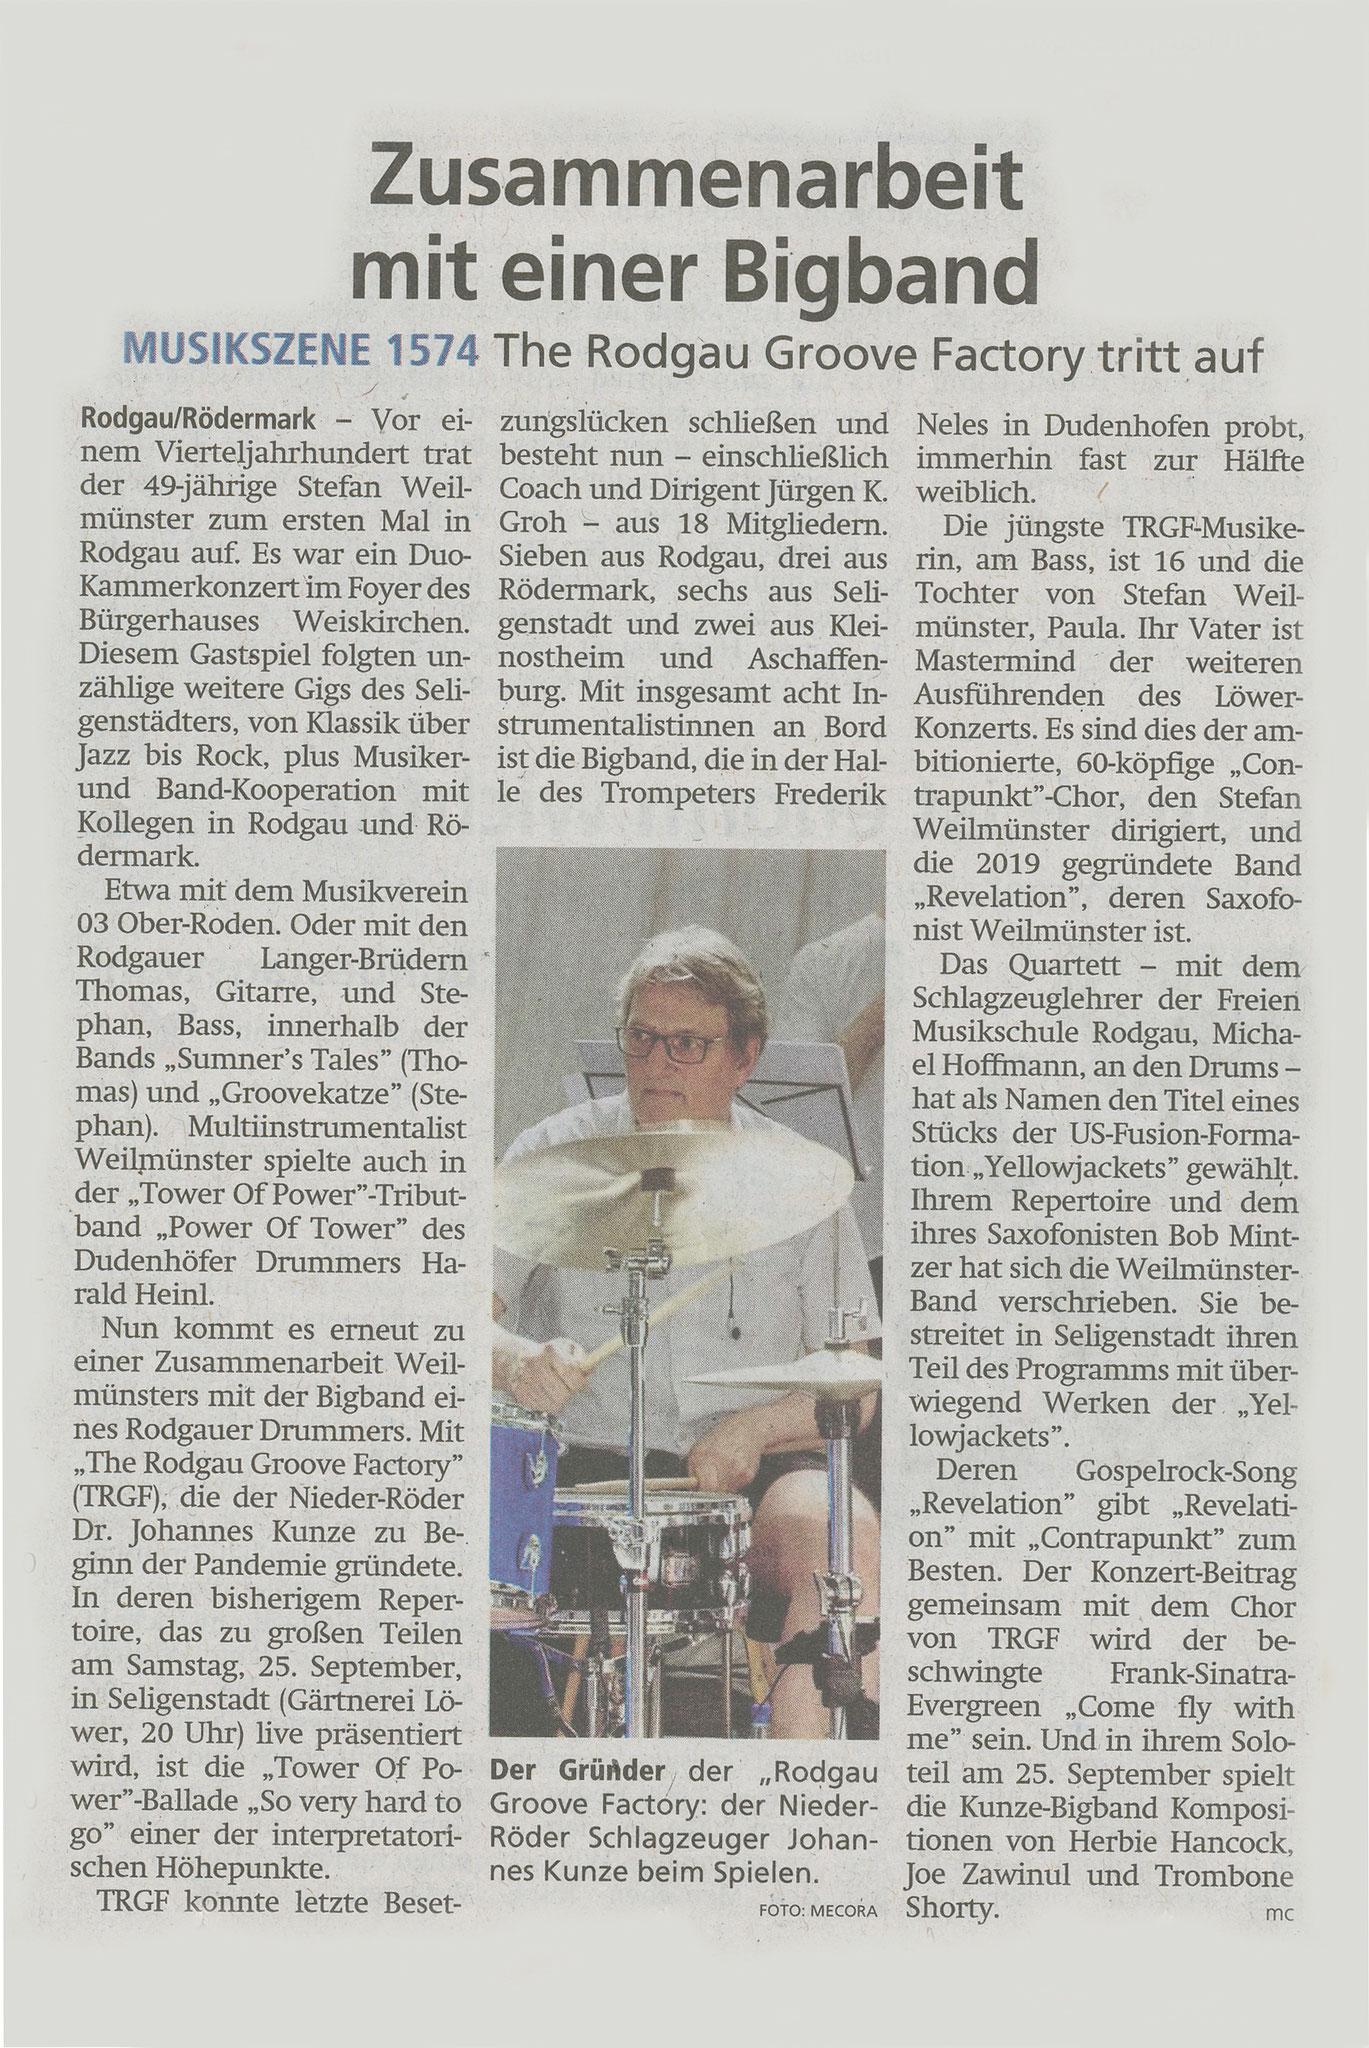 Offenbach Post, 11. September 2021